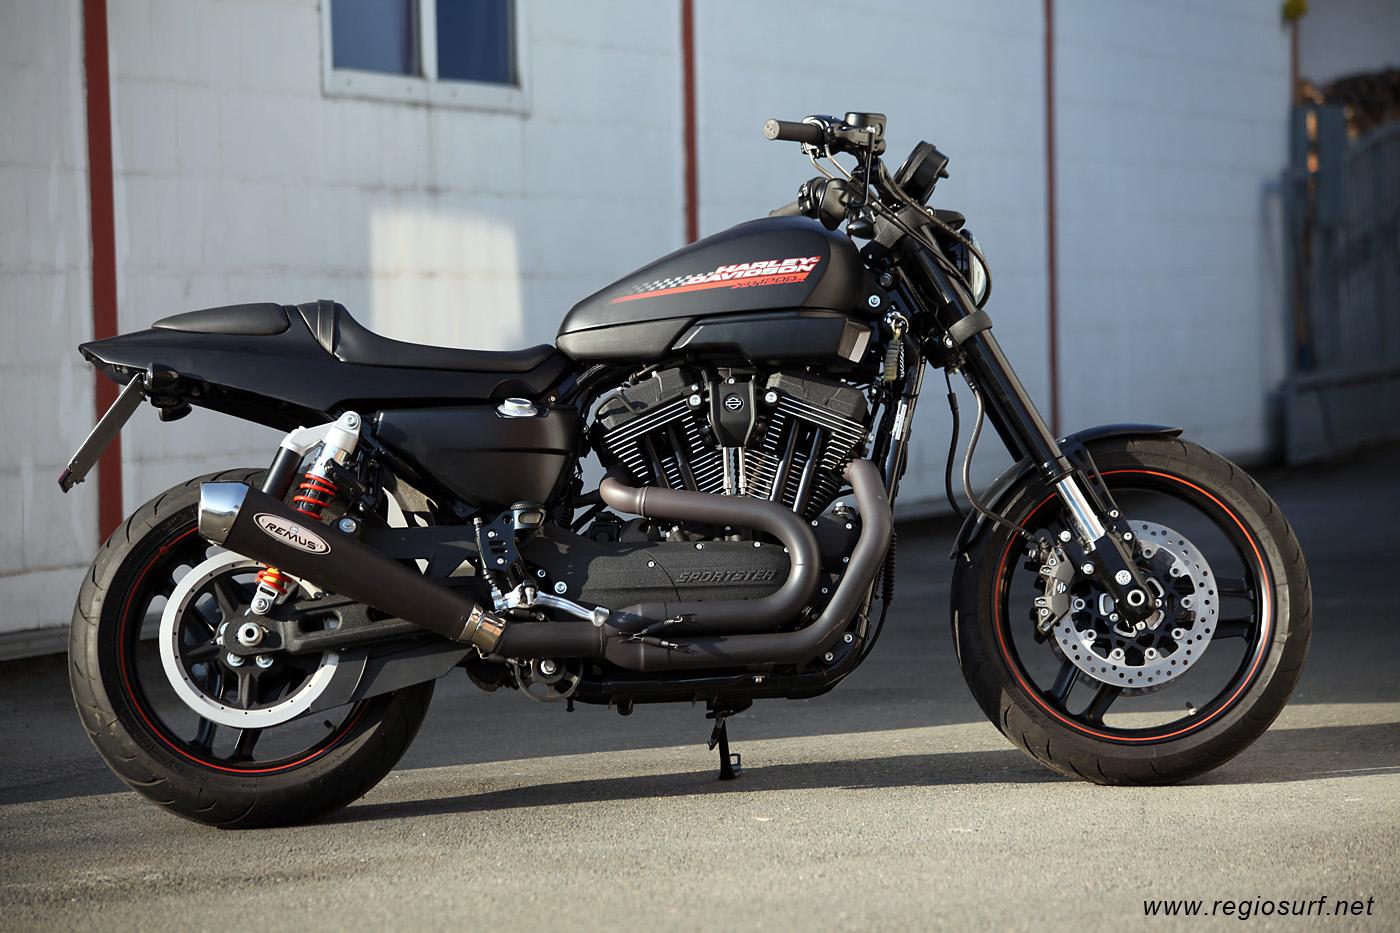 MSG williamhill live streaming vollbild - Motorradwerkstatt Triumph Moto Guzzi Harley-Davidson Spezialist ...